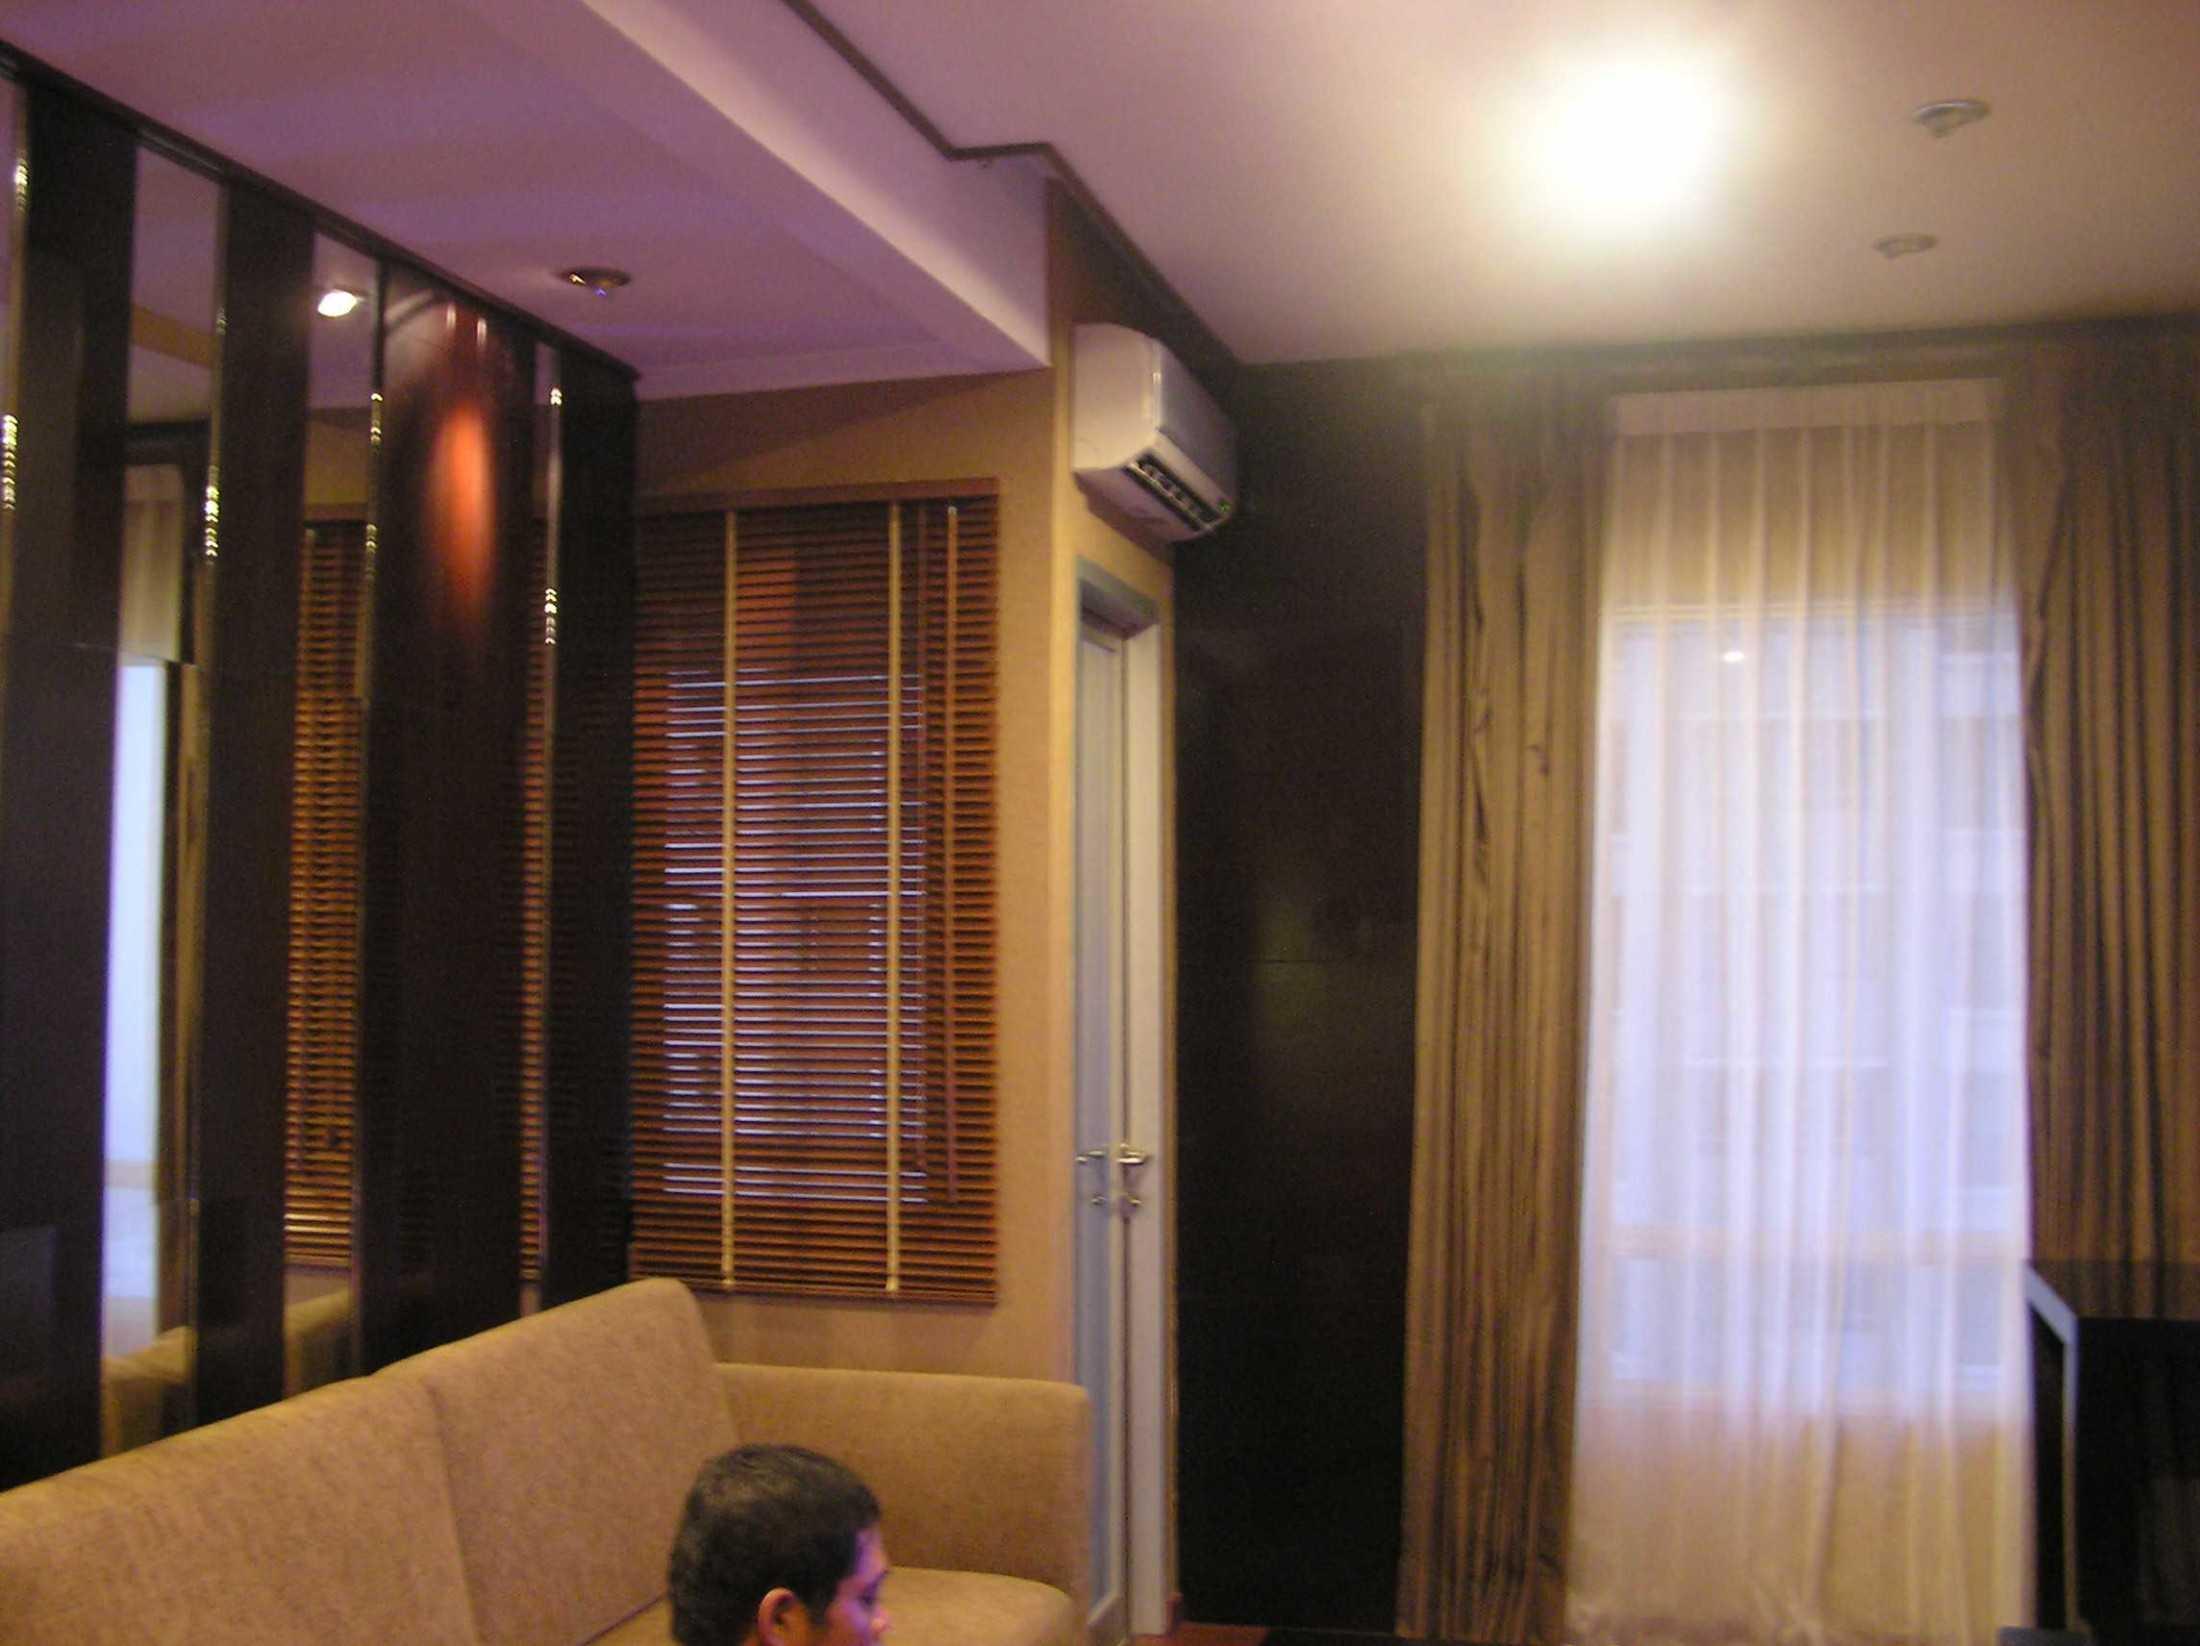 Ega Cipta Pratama Interior Apartment Sudirman Park Jakarta Jakarta, Daerah Khusus Ibukota Jakarta, Indonesia Jakarta, Daerah Khusus Ibukota Jakarta, Indonesia Ega-Cipta-Pratama-Interior-Apartment-Sudirman-Park-Jakarta  55472